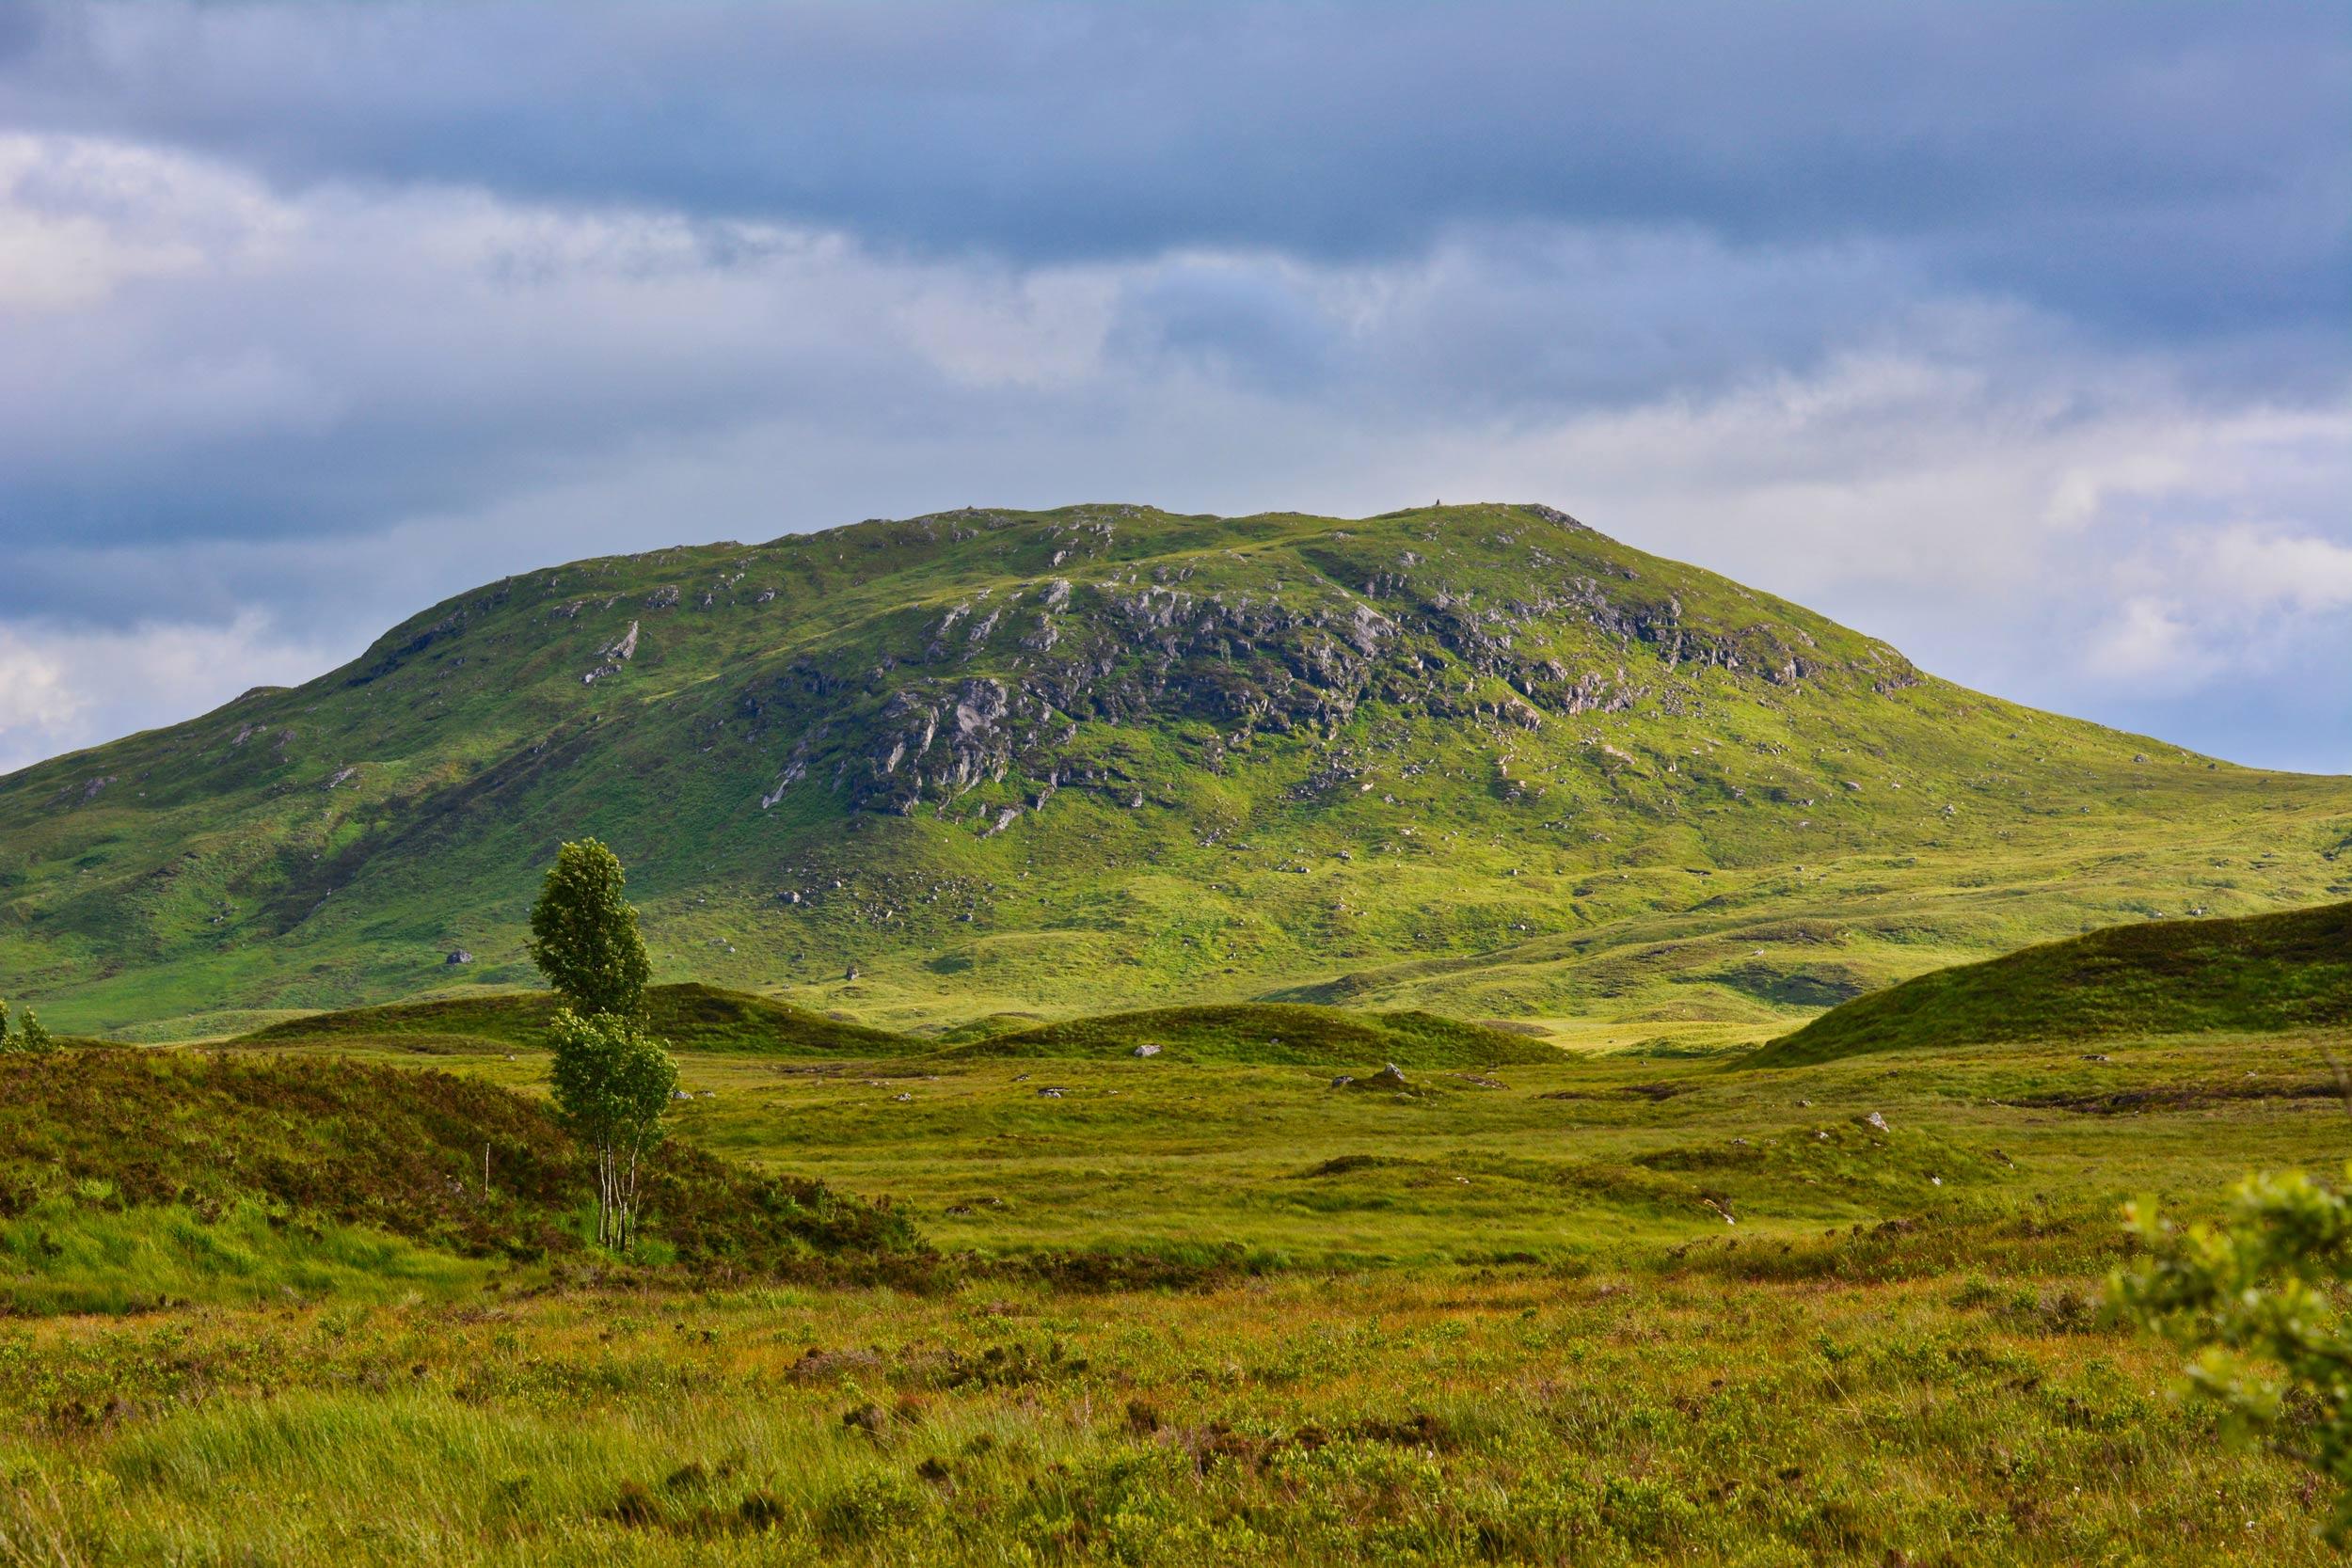 Szkocki krajobraz - Rannoch Moor